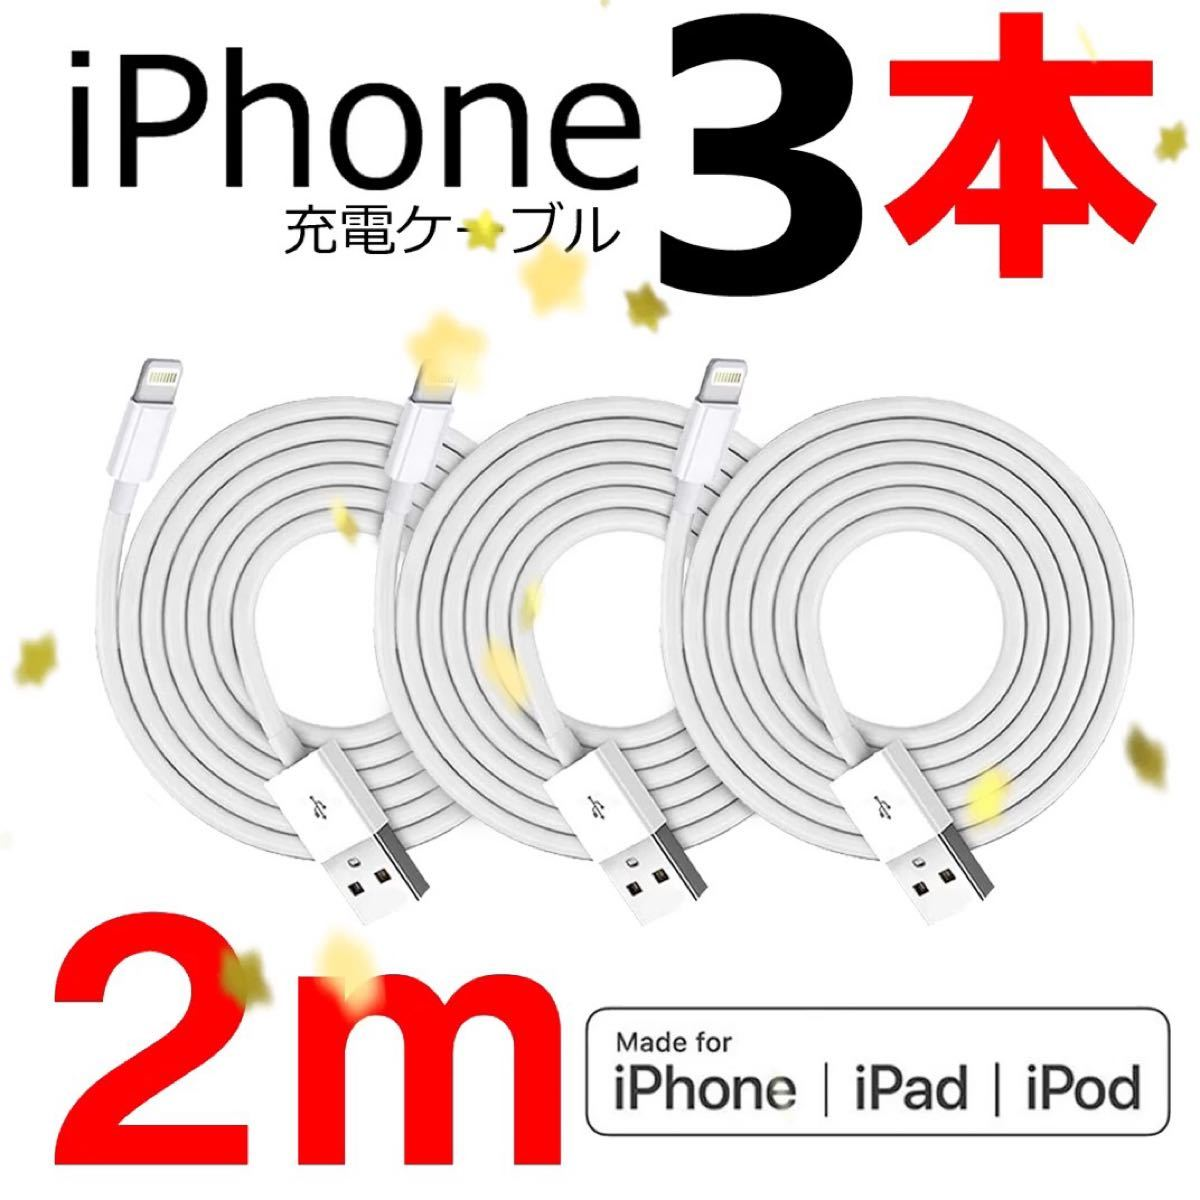 iPhone 充電器 充電ケーブル lightning cable ライトニングケーブル 急速充電 USB 高速充電 データ通信